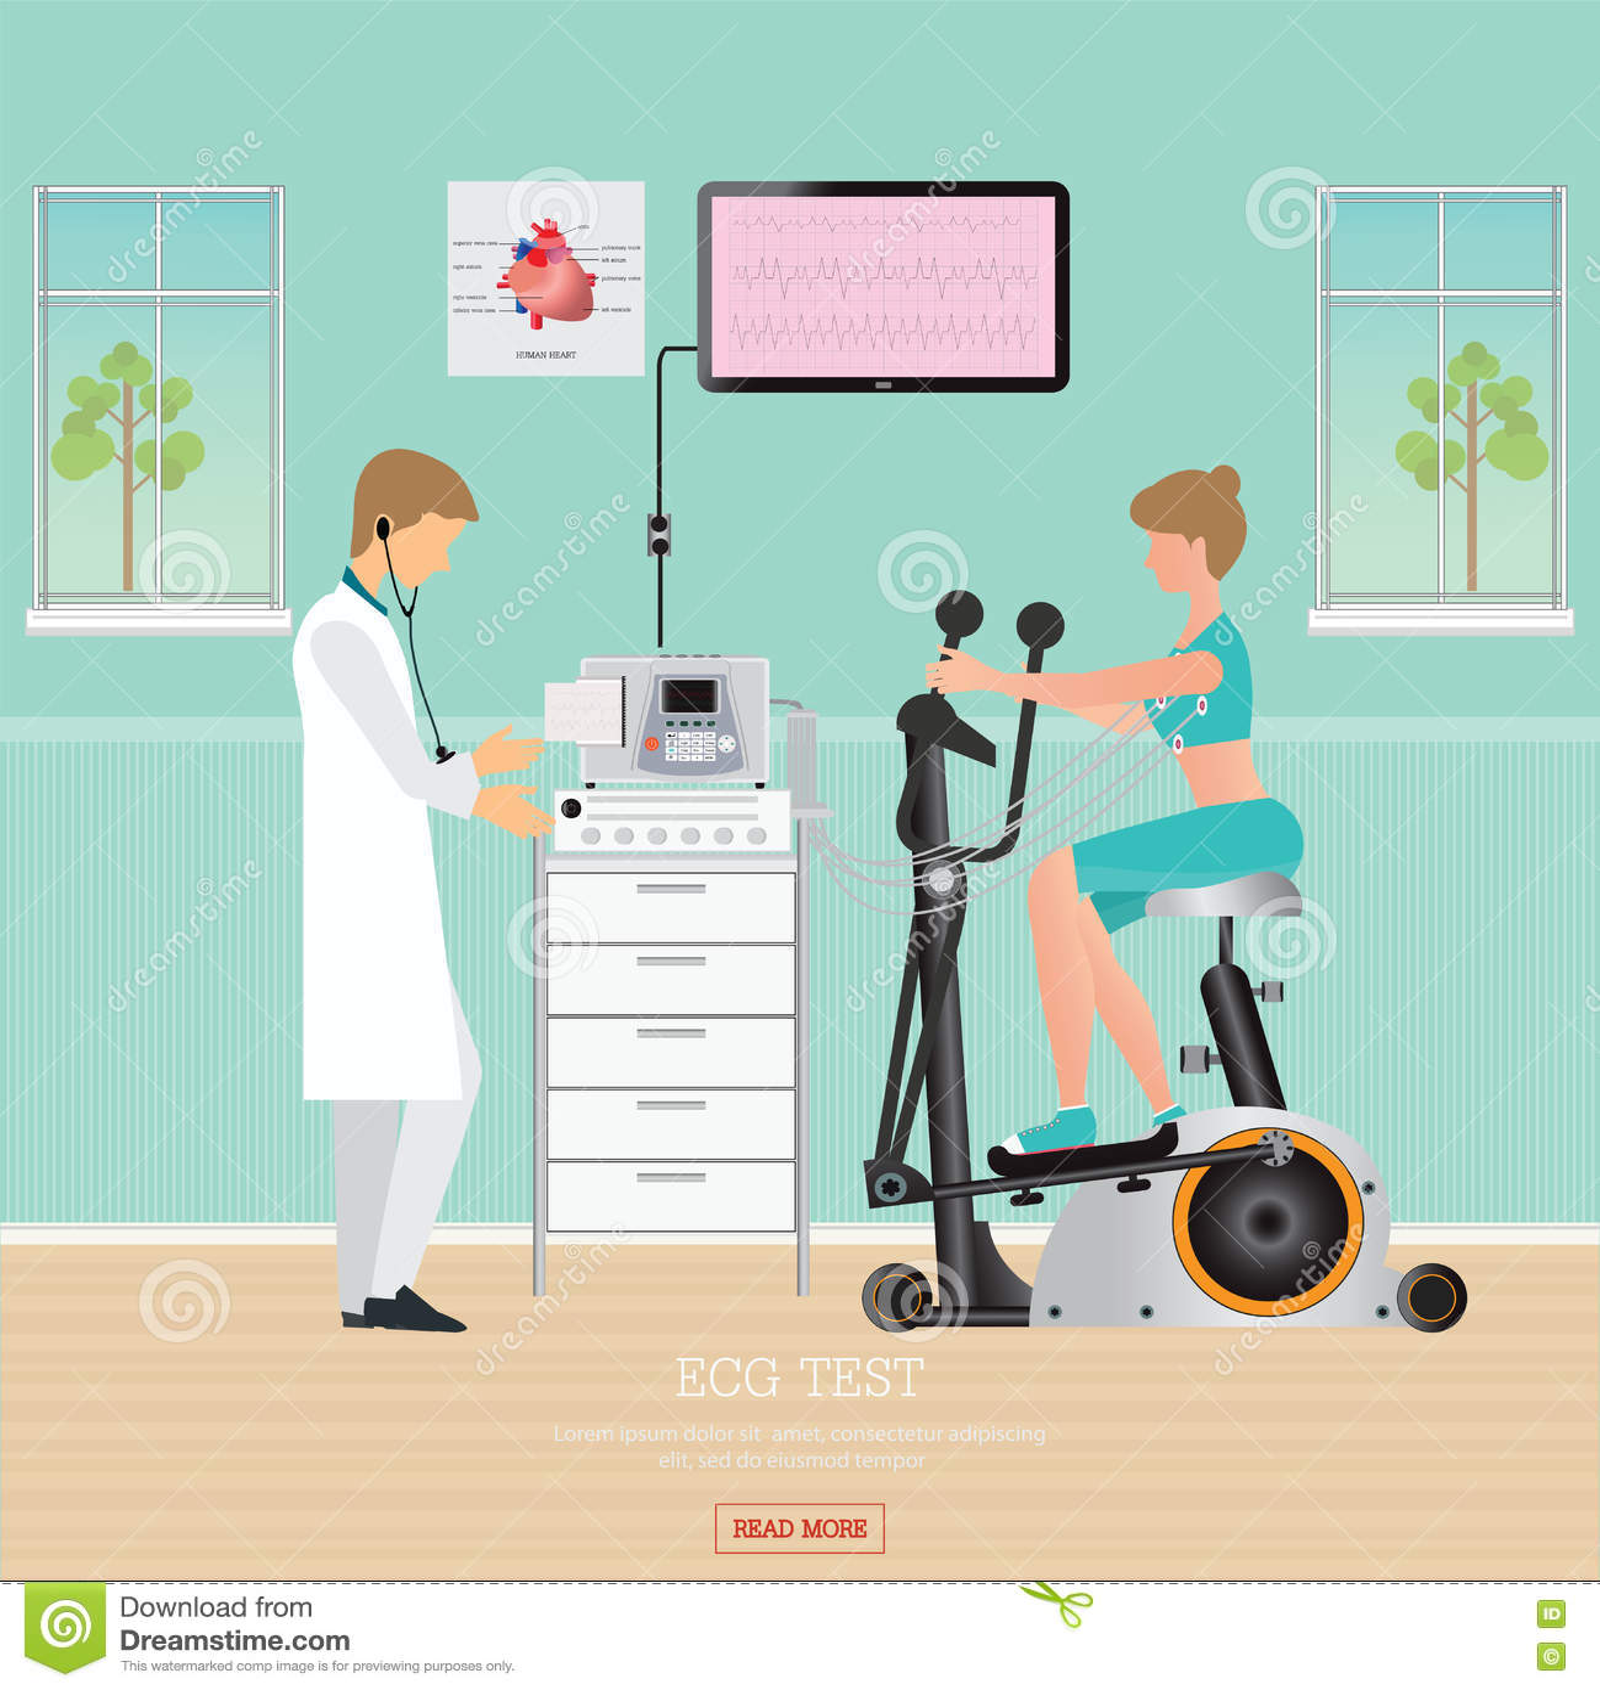 Stress Test Your Portfolio: Heart Exercise Vector Illustration